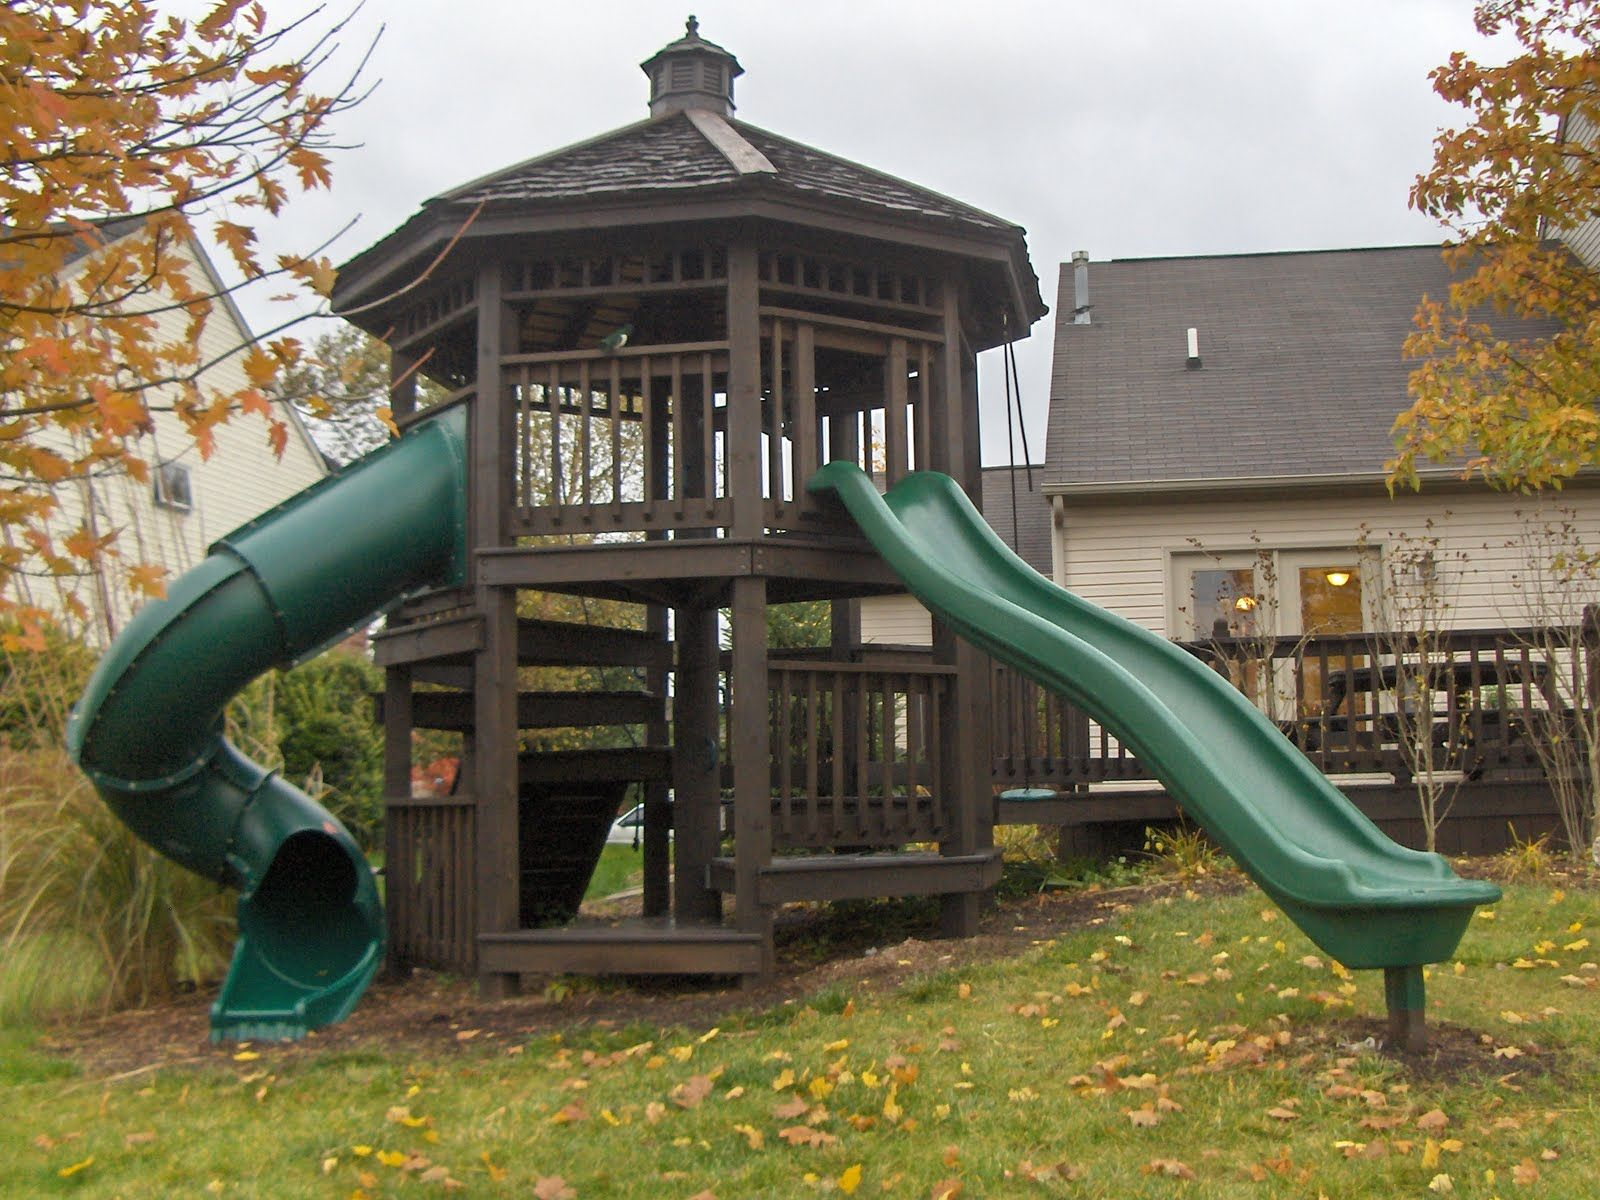 awesome gazebo style playhouse with slides